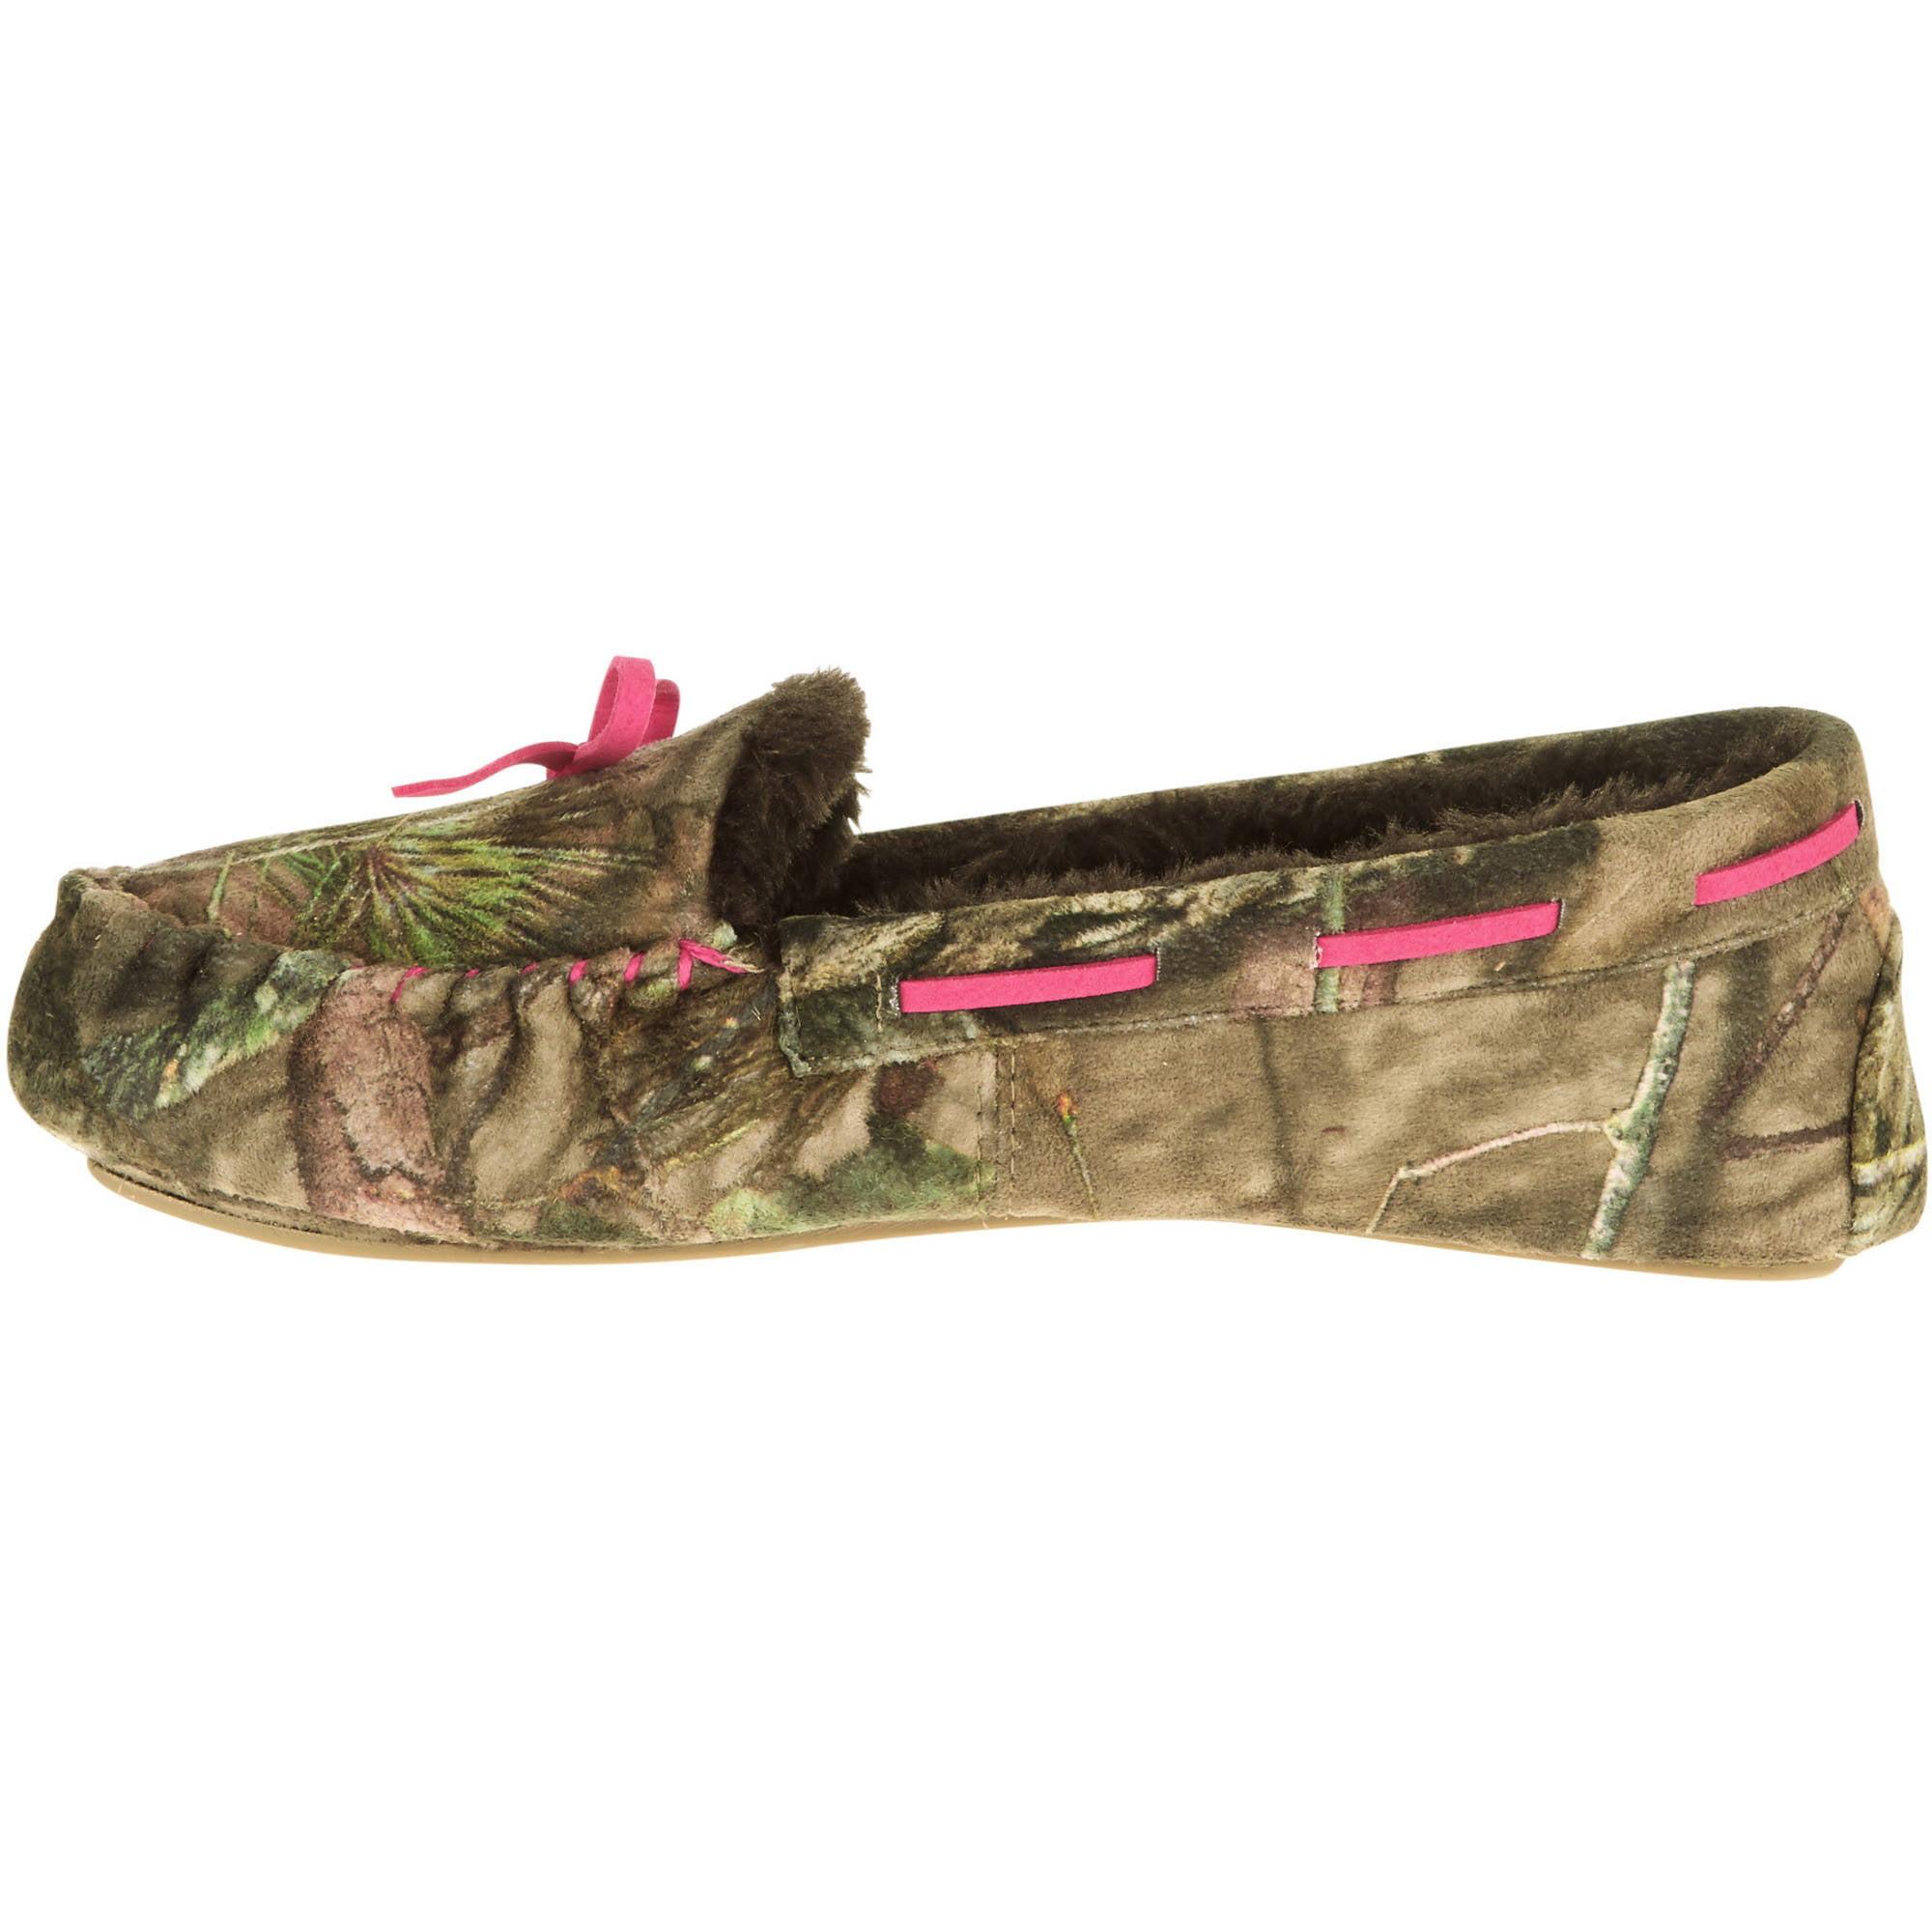 Mossy Oak Womenu0027s Camo Moccasin Slippers   Walmart.com